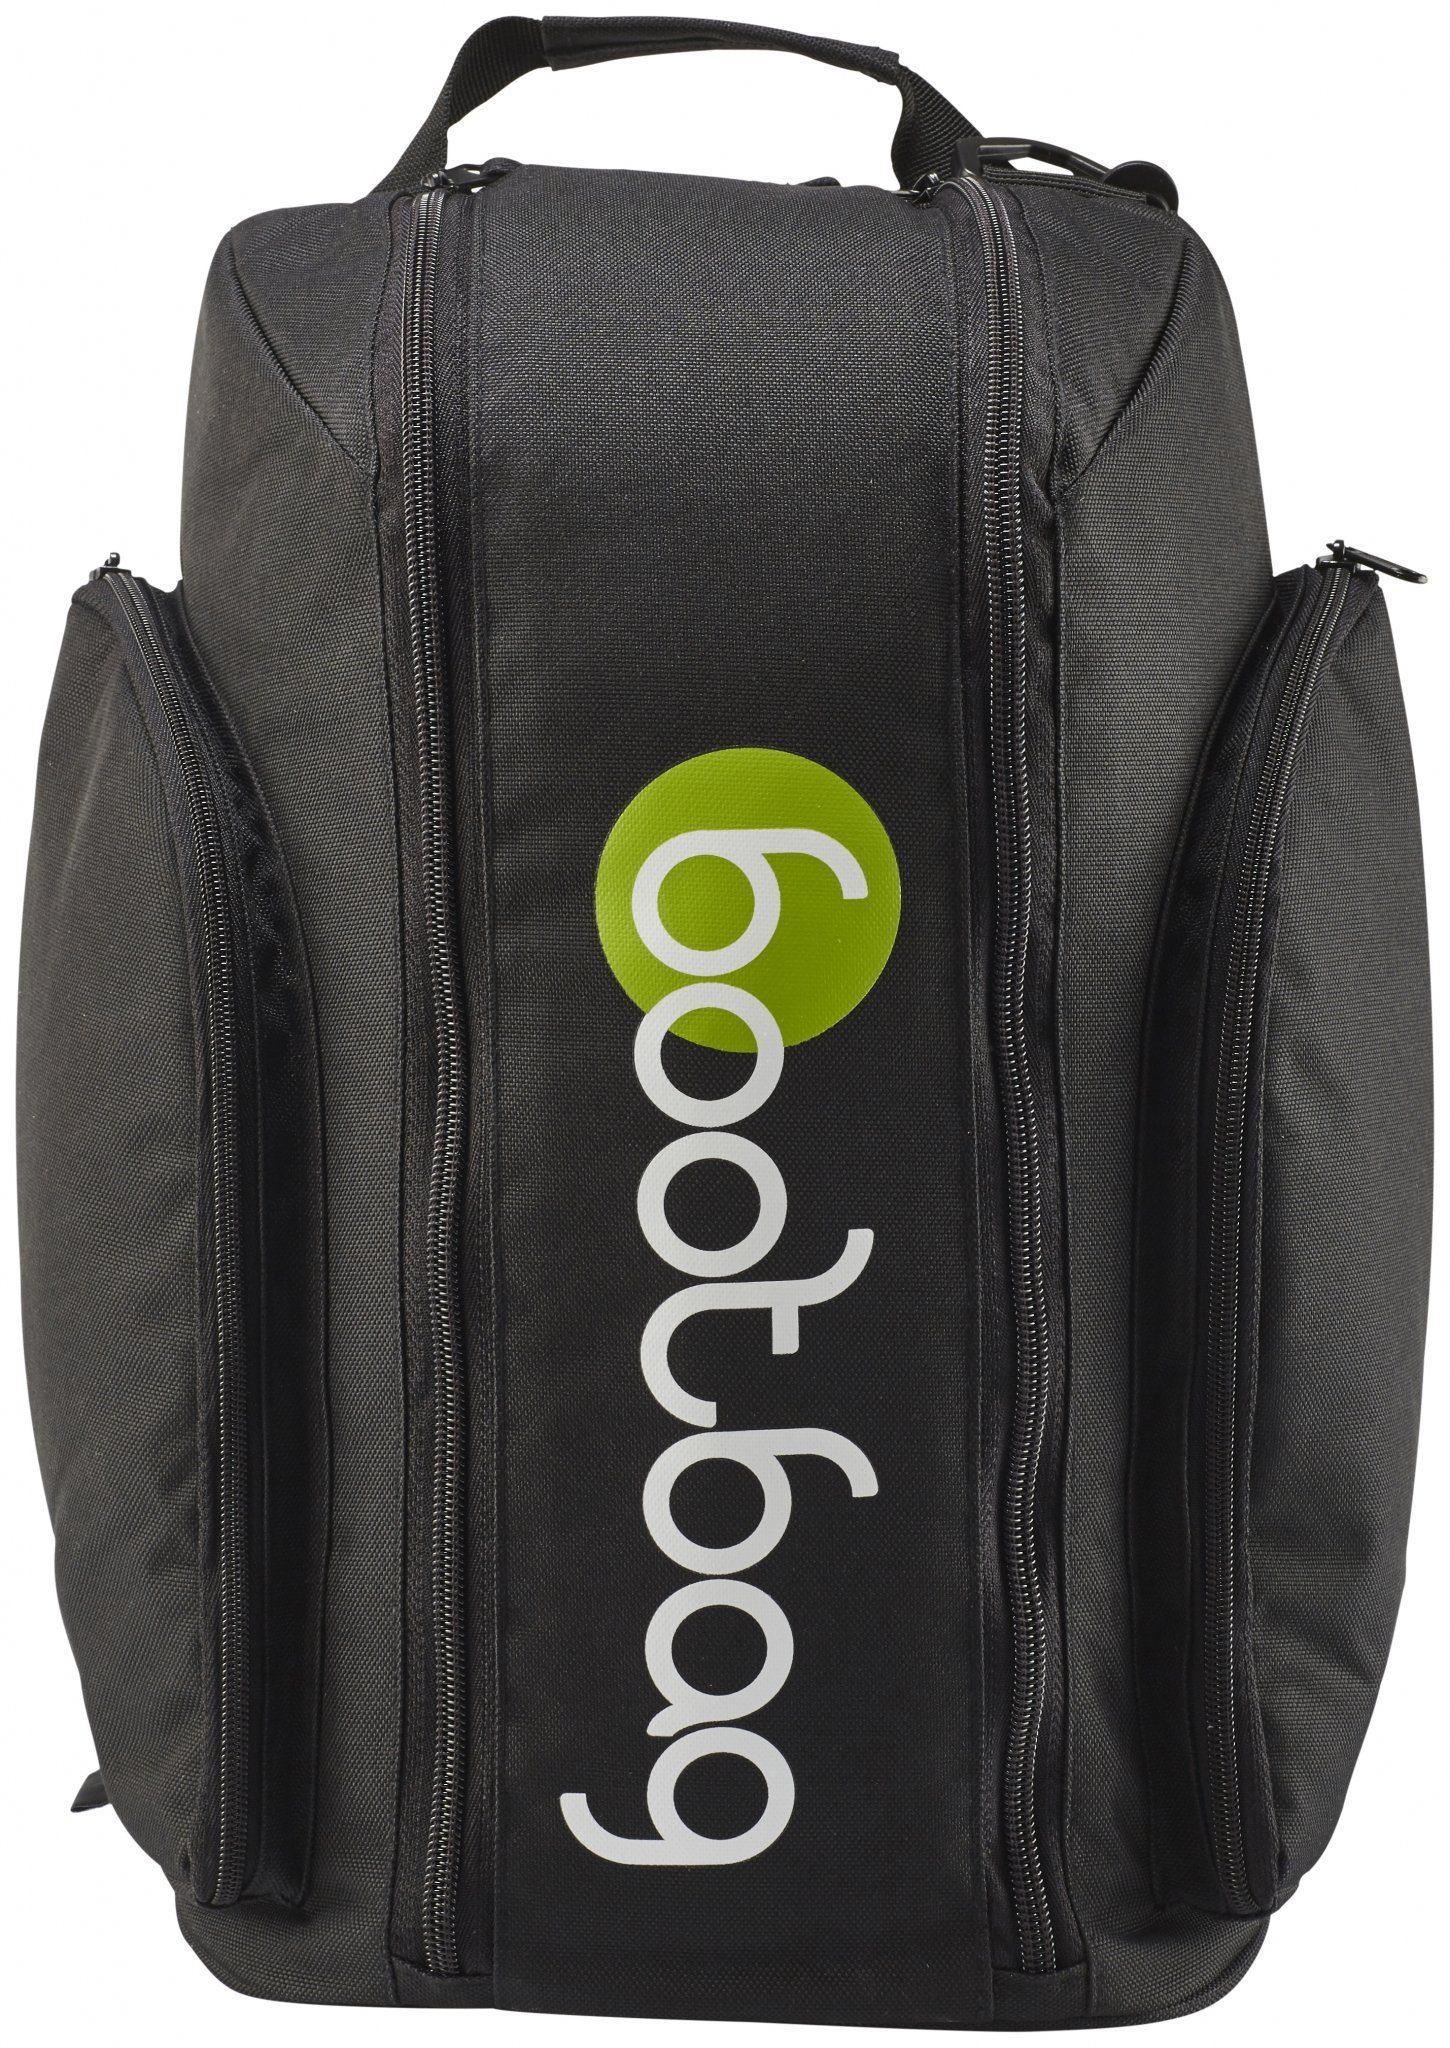 Hebie Gepäckträgertasche »bootbag Gepäckträgertasche schwarz«